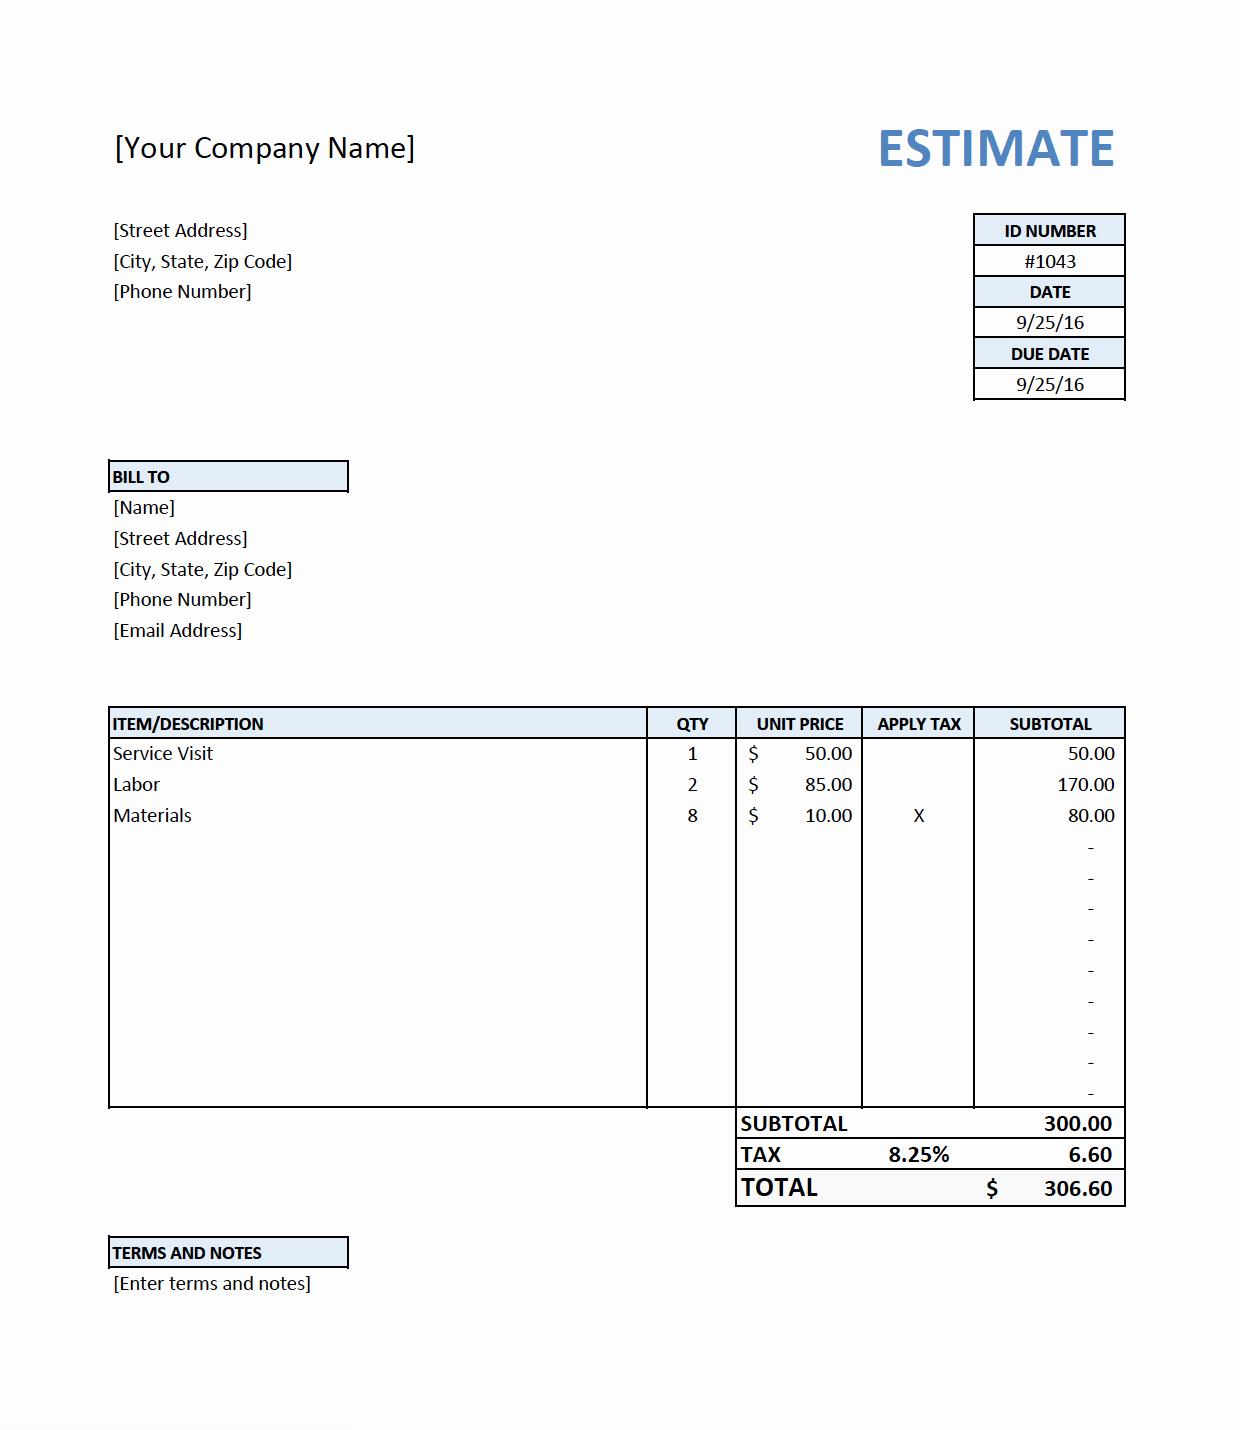 Free Construction Estimate Template New Free Estimate Template for Contractors